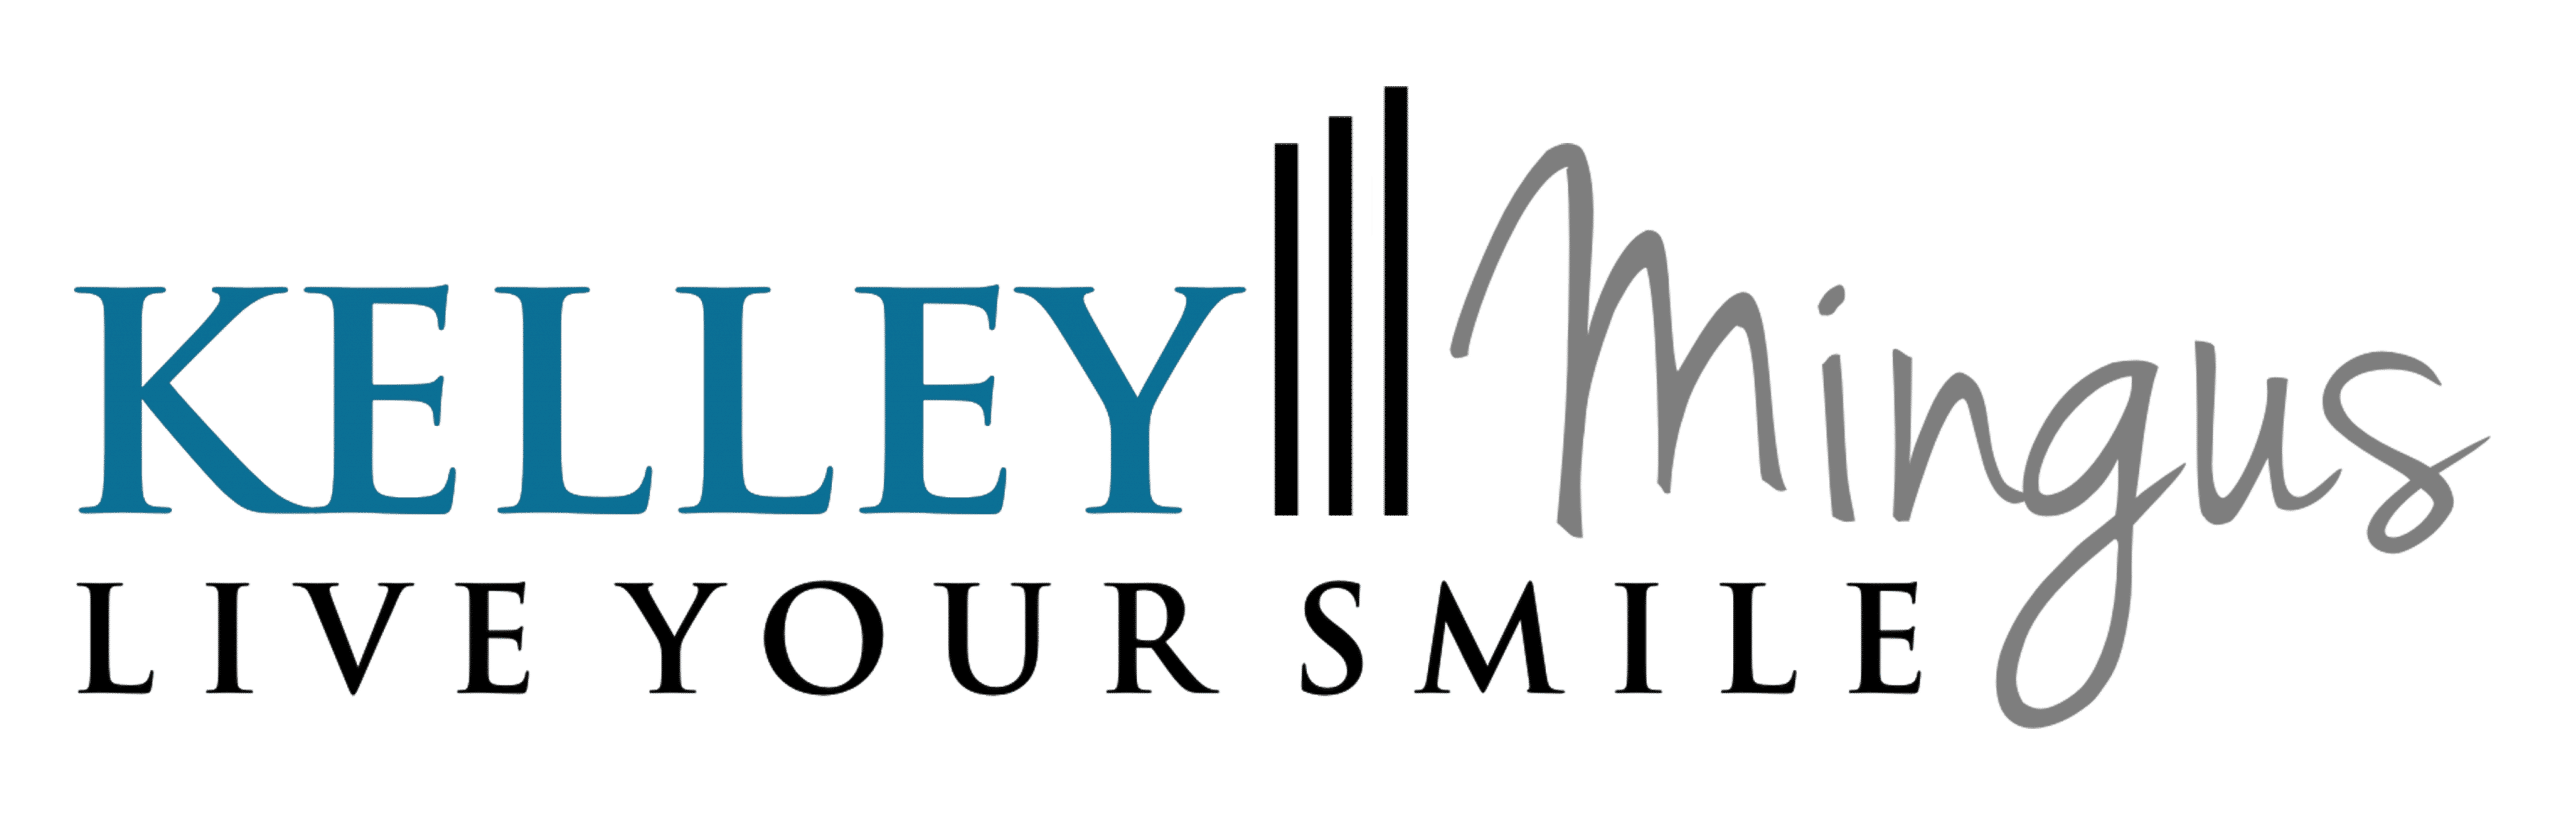 DISTINCTIVE DENTISTRY, Kelley Mingus, Live your smile logo